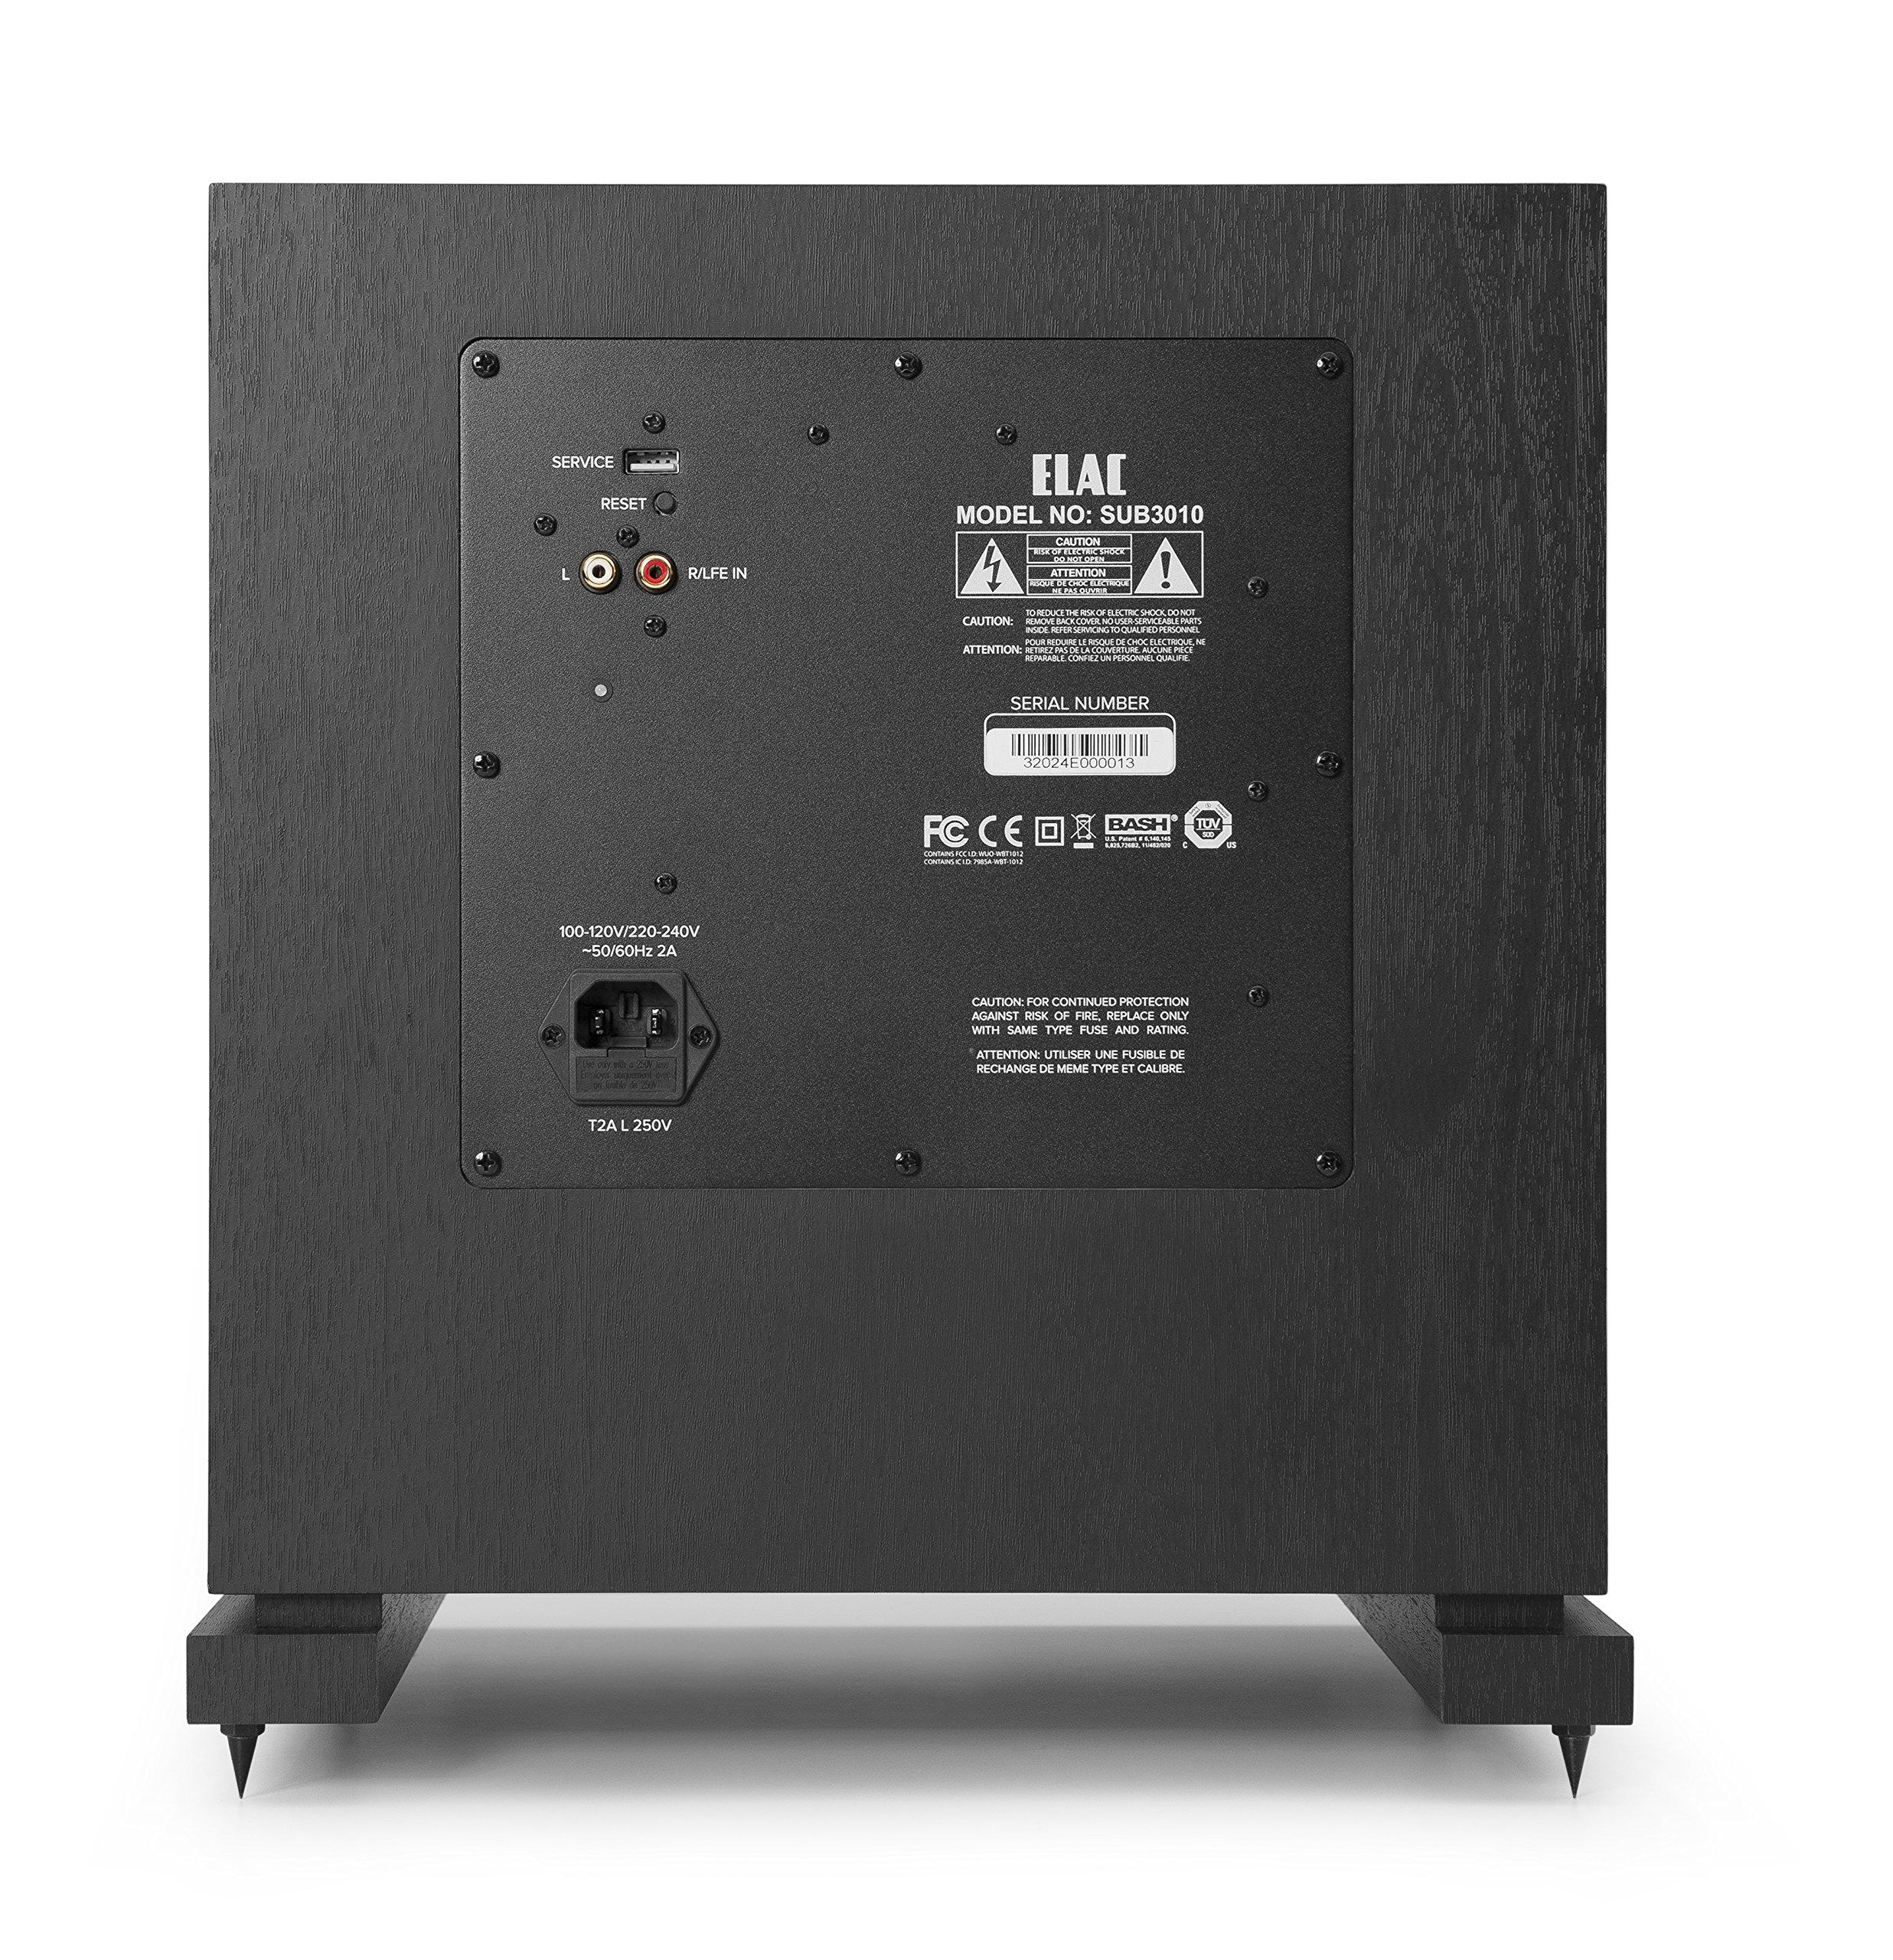 ELAC Debut 2.0 SUB3010 400 Watt Powered Subwoofer, Black by Elac (Image #3)